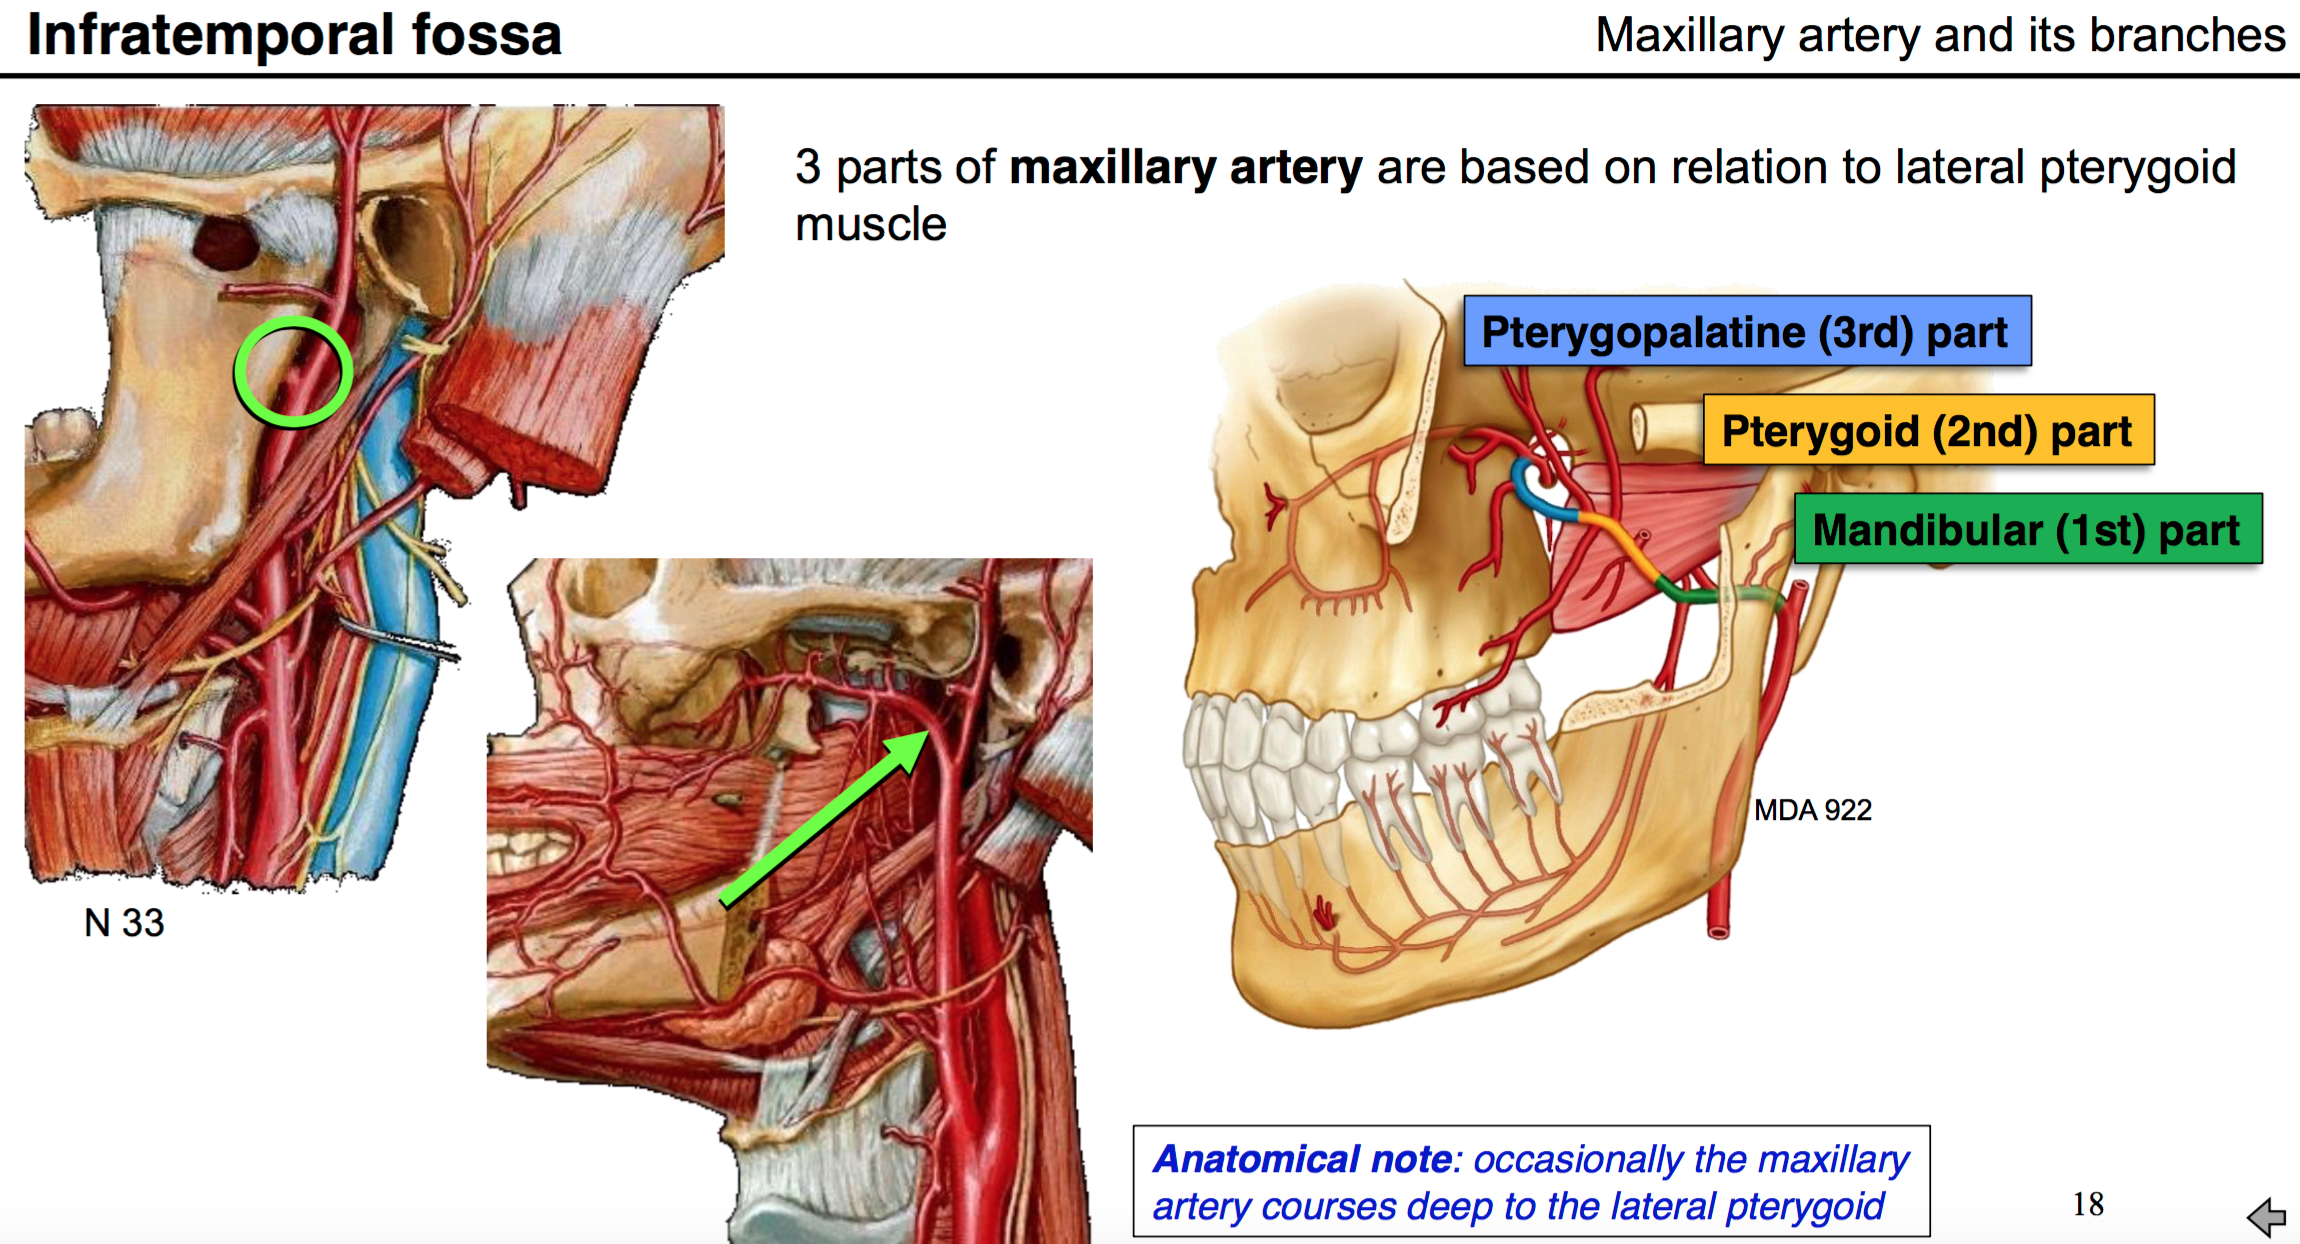 30 Anatomy G60 Temporal Fossa And Infratemporal Fossa Flashcards